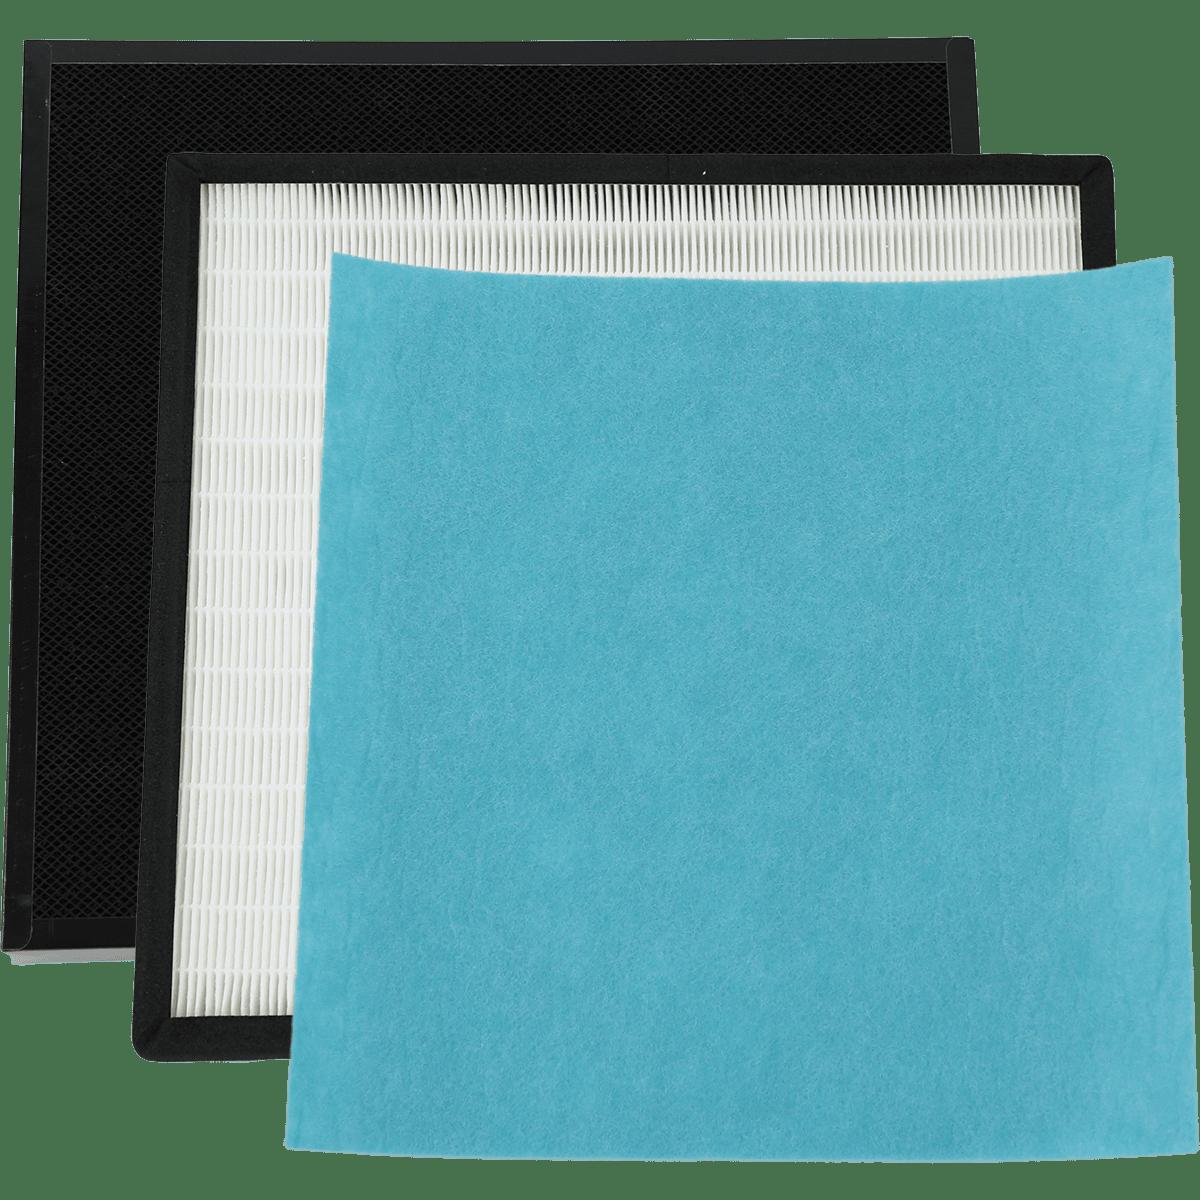 Oransi v-hepa Max Replacement Filter Kit (RFM80) or2262